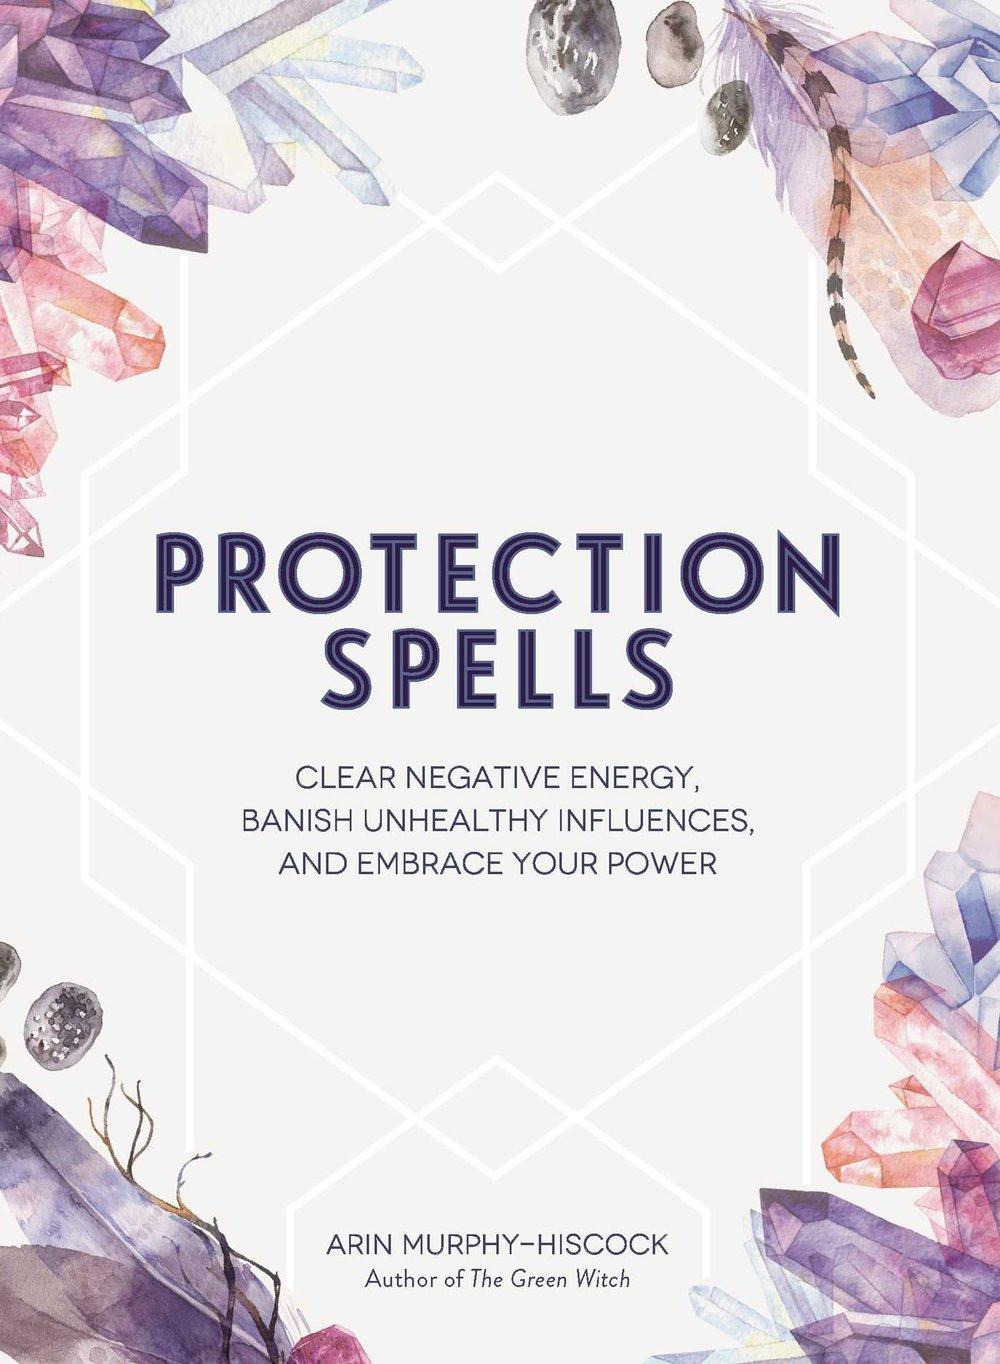 protection-spells-9781507208328_hr.jpg